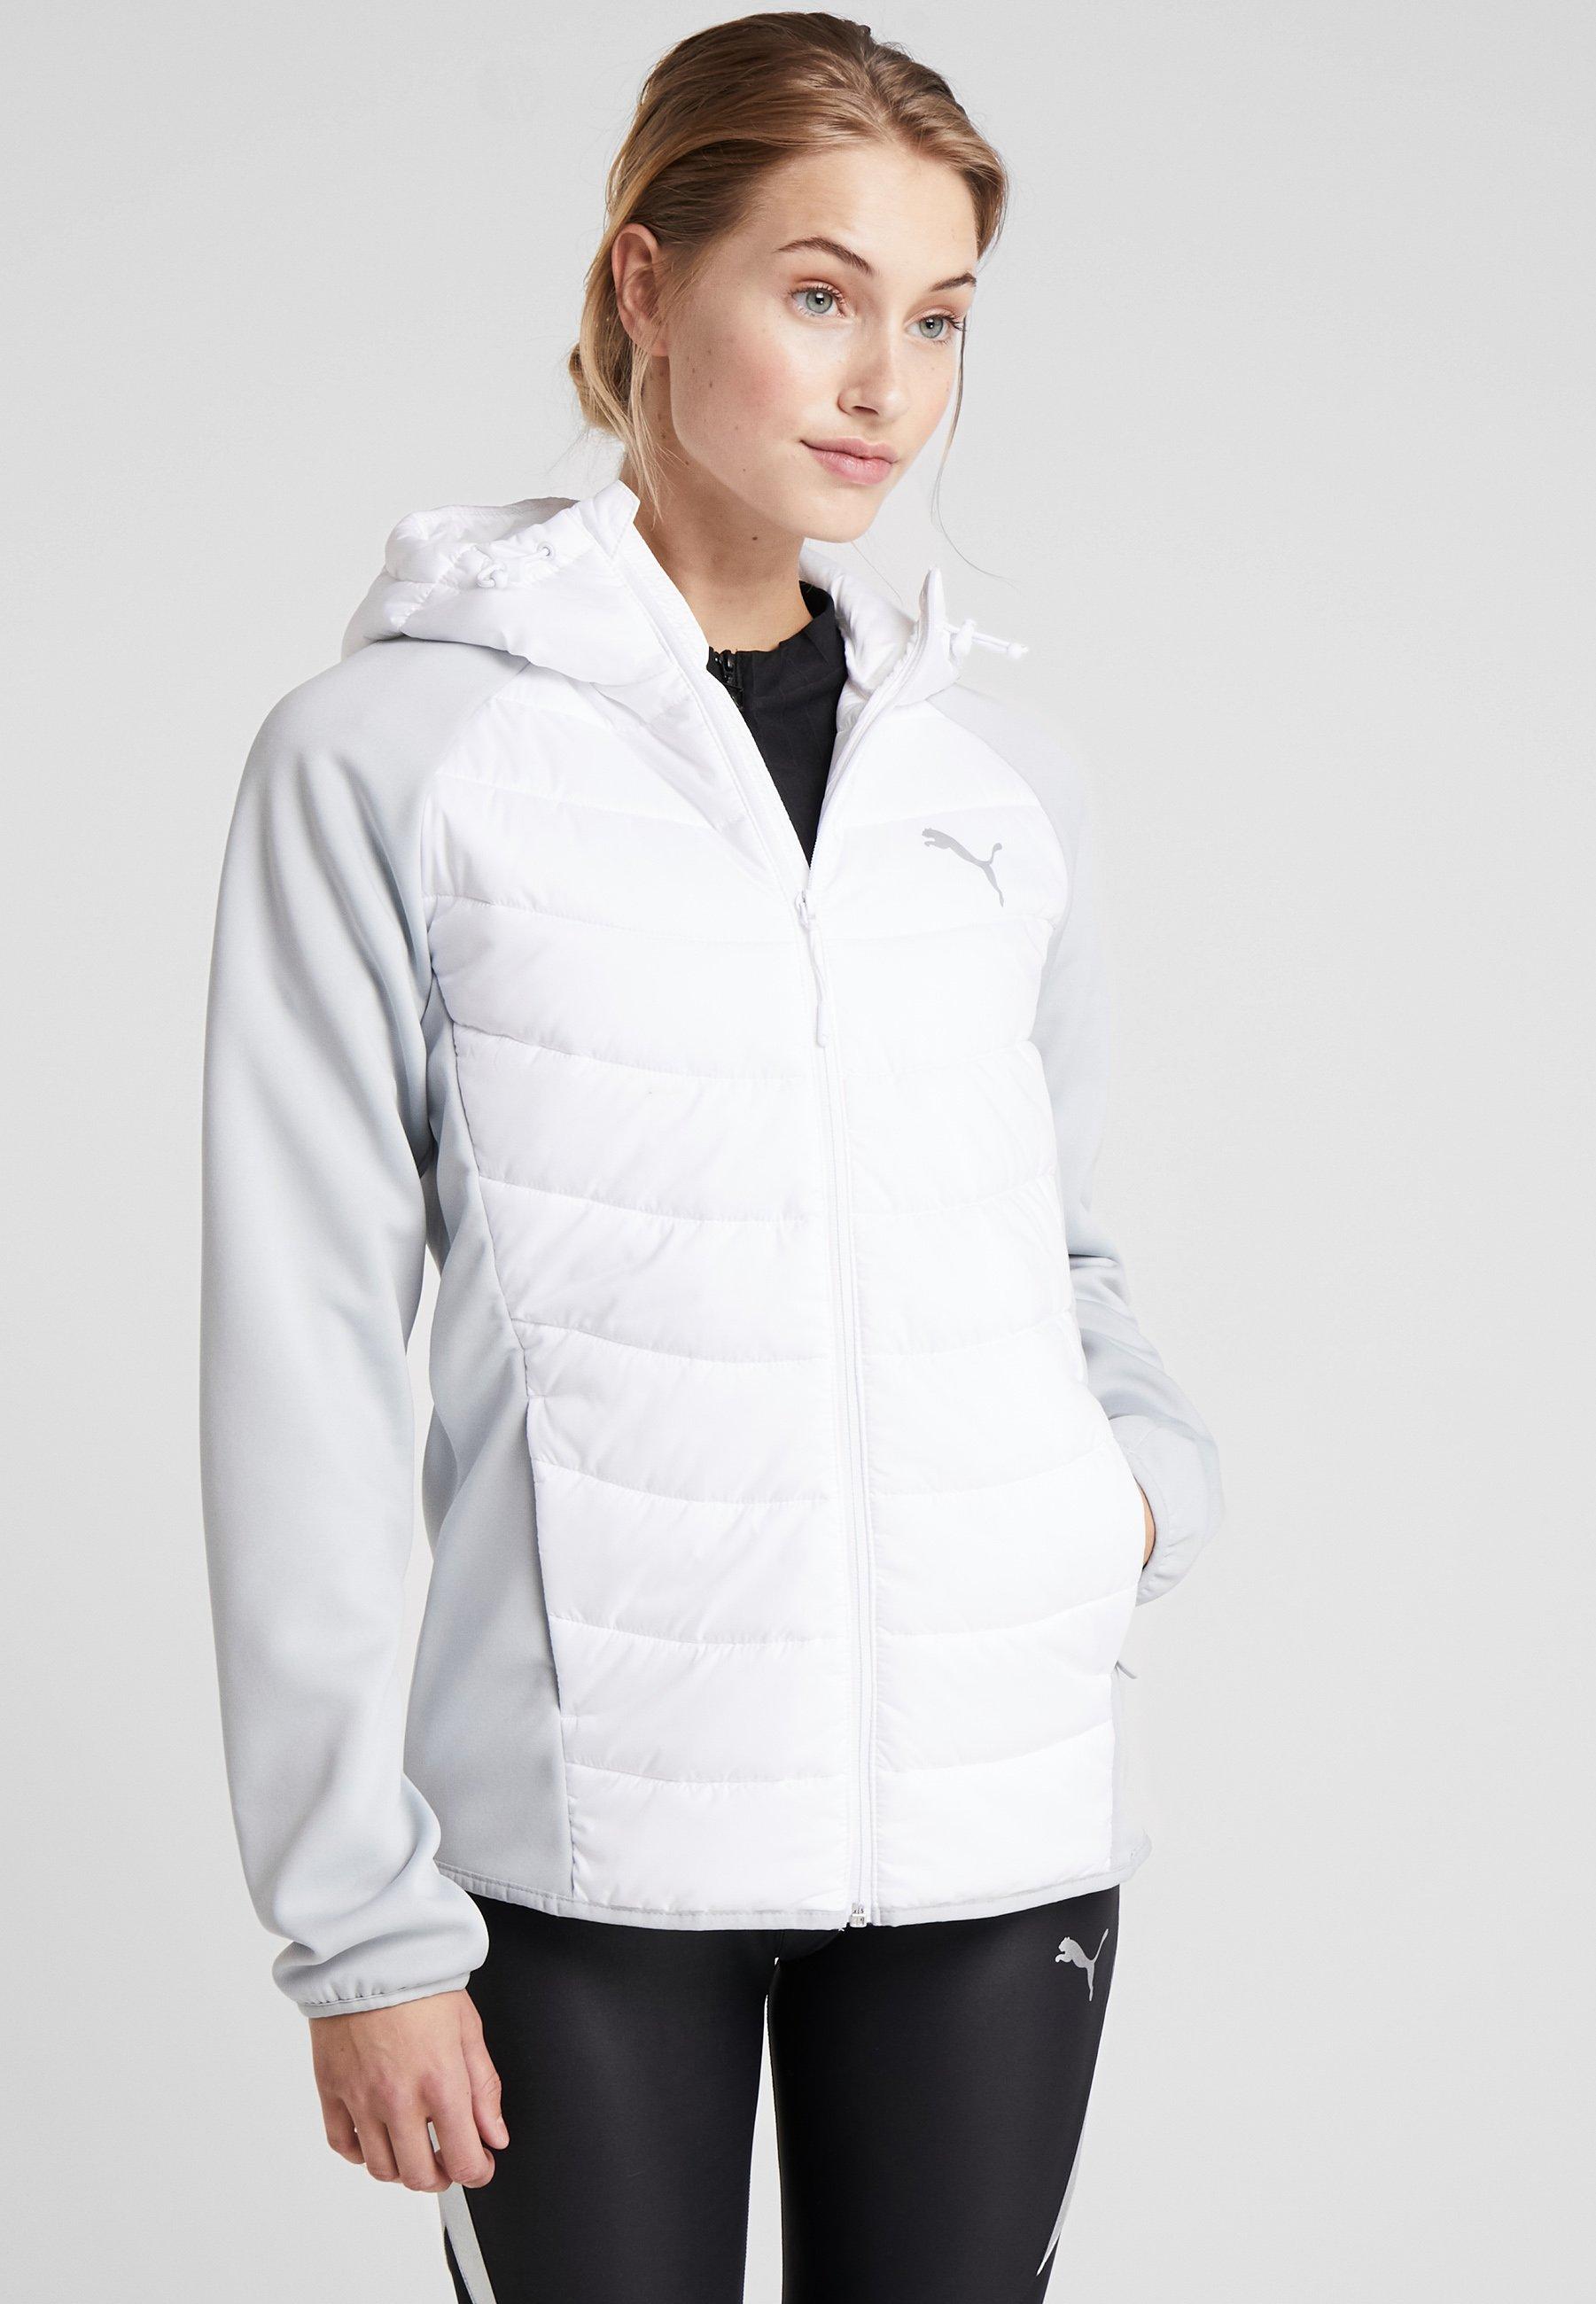 Style Imperméable White high Hybrid JacketVeste Puma Rise 0vmnN8w